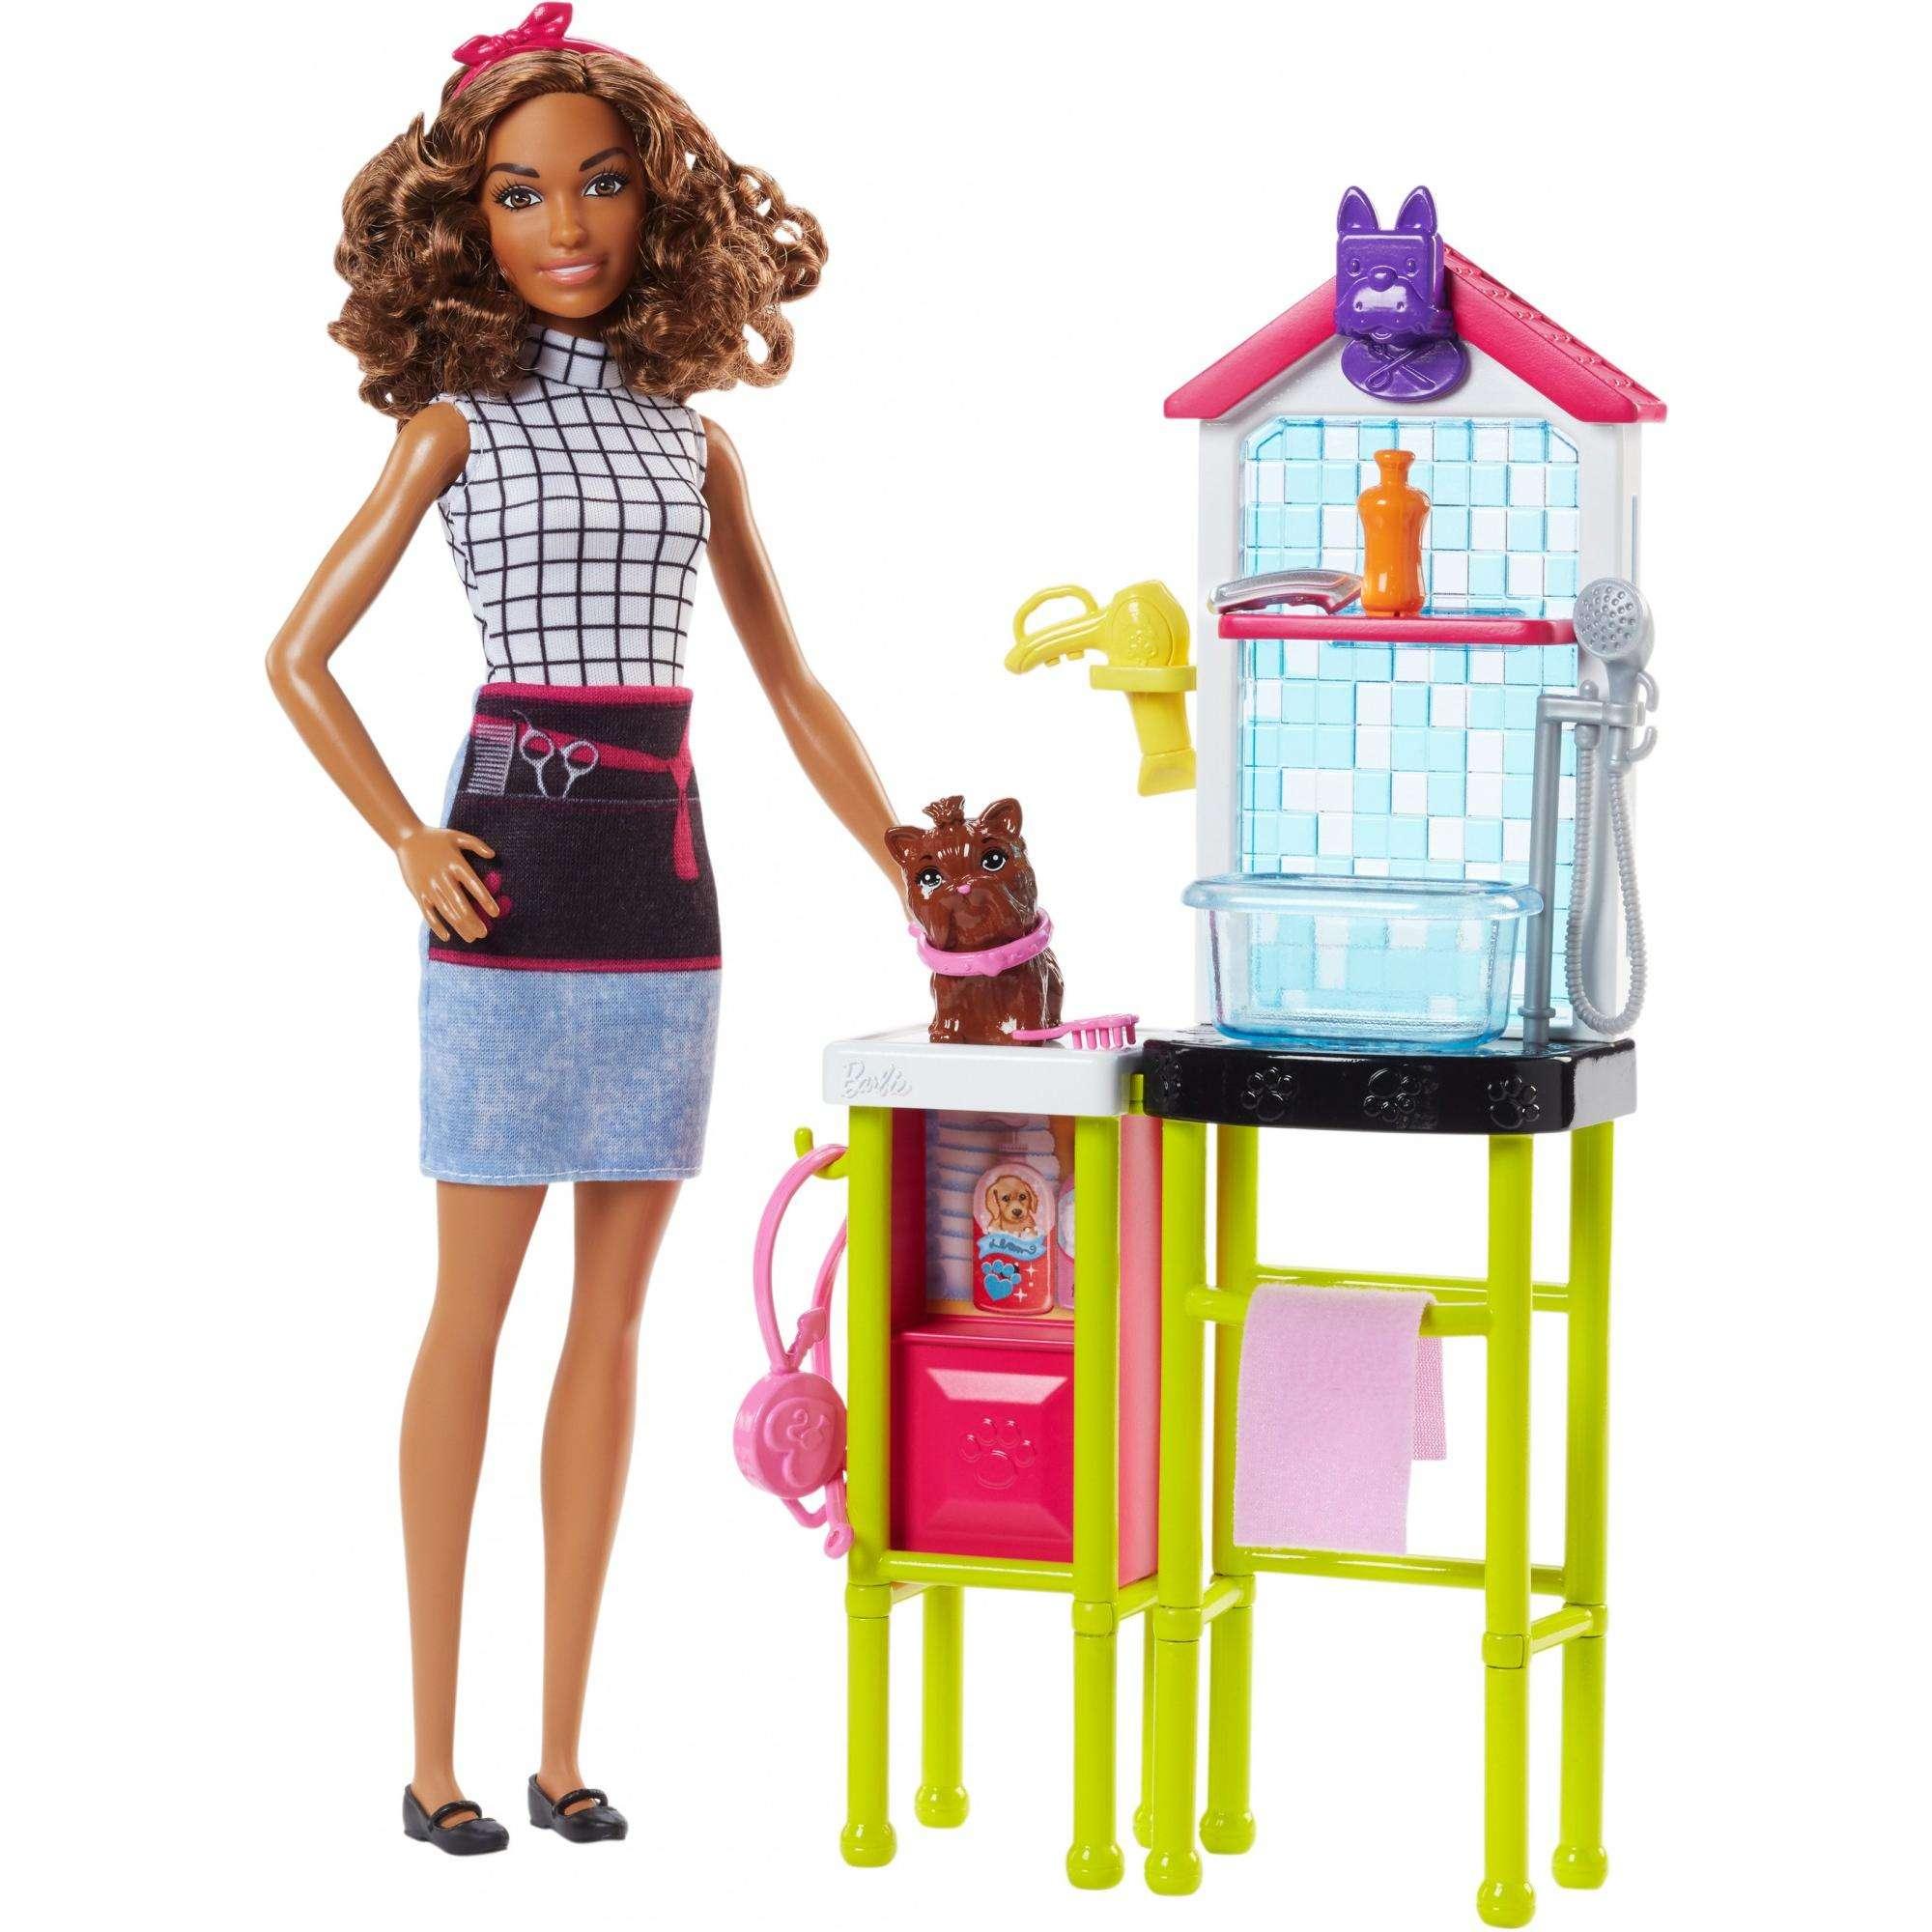 Barbie Careers Animal Pet Groomer Playset and Doll